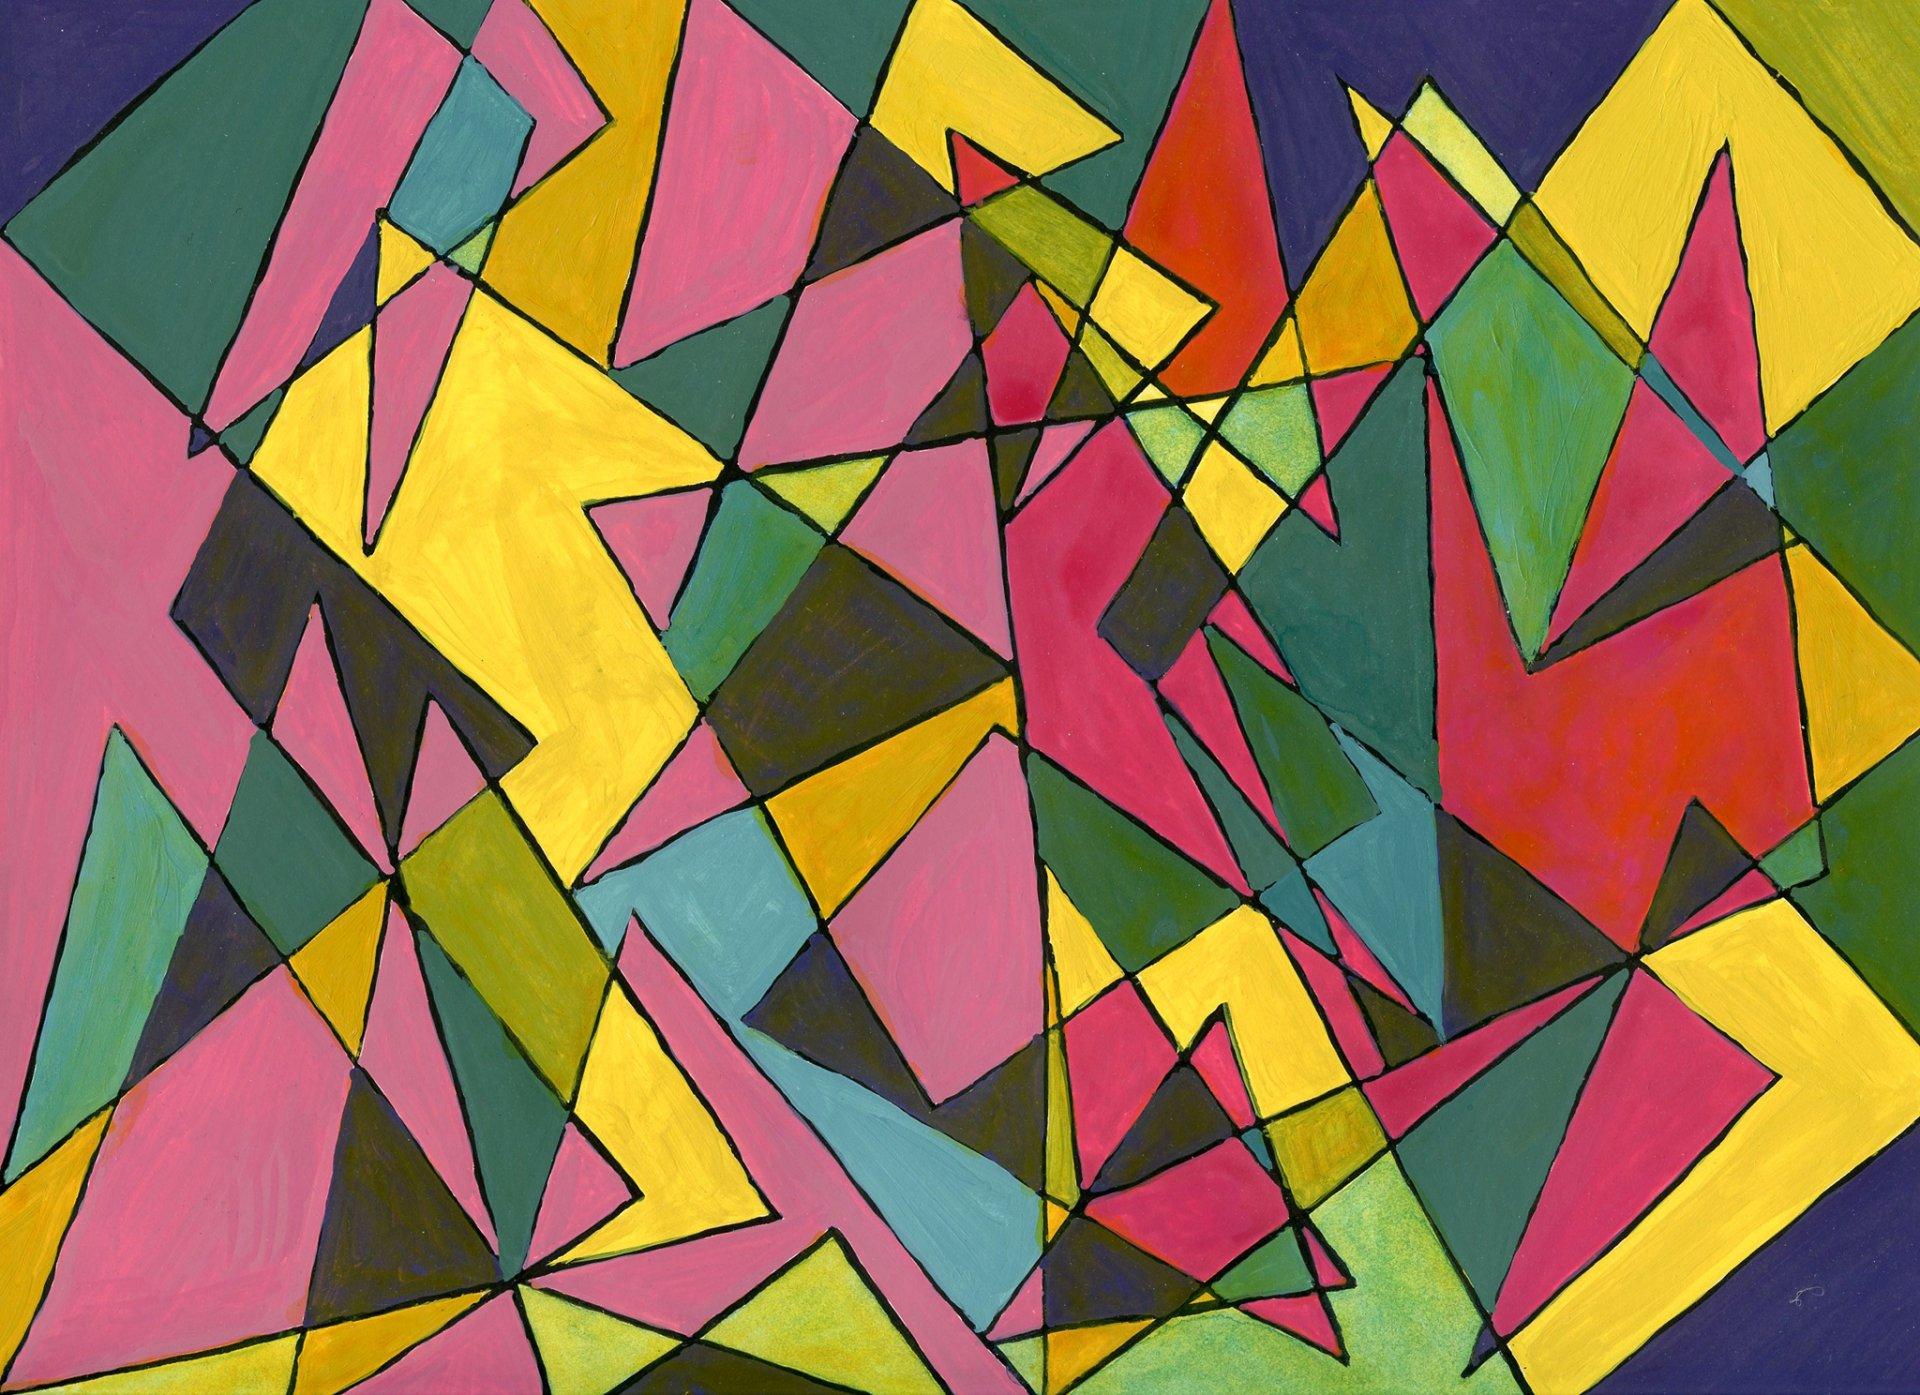 картинки для картин геометрии соблюдать баланс